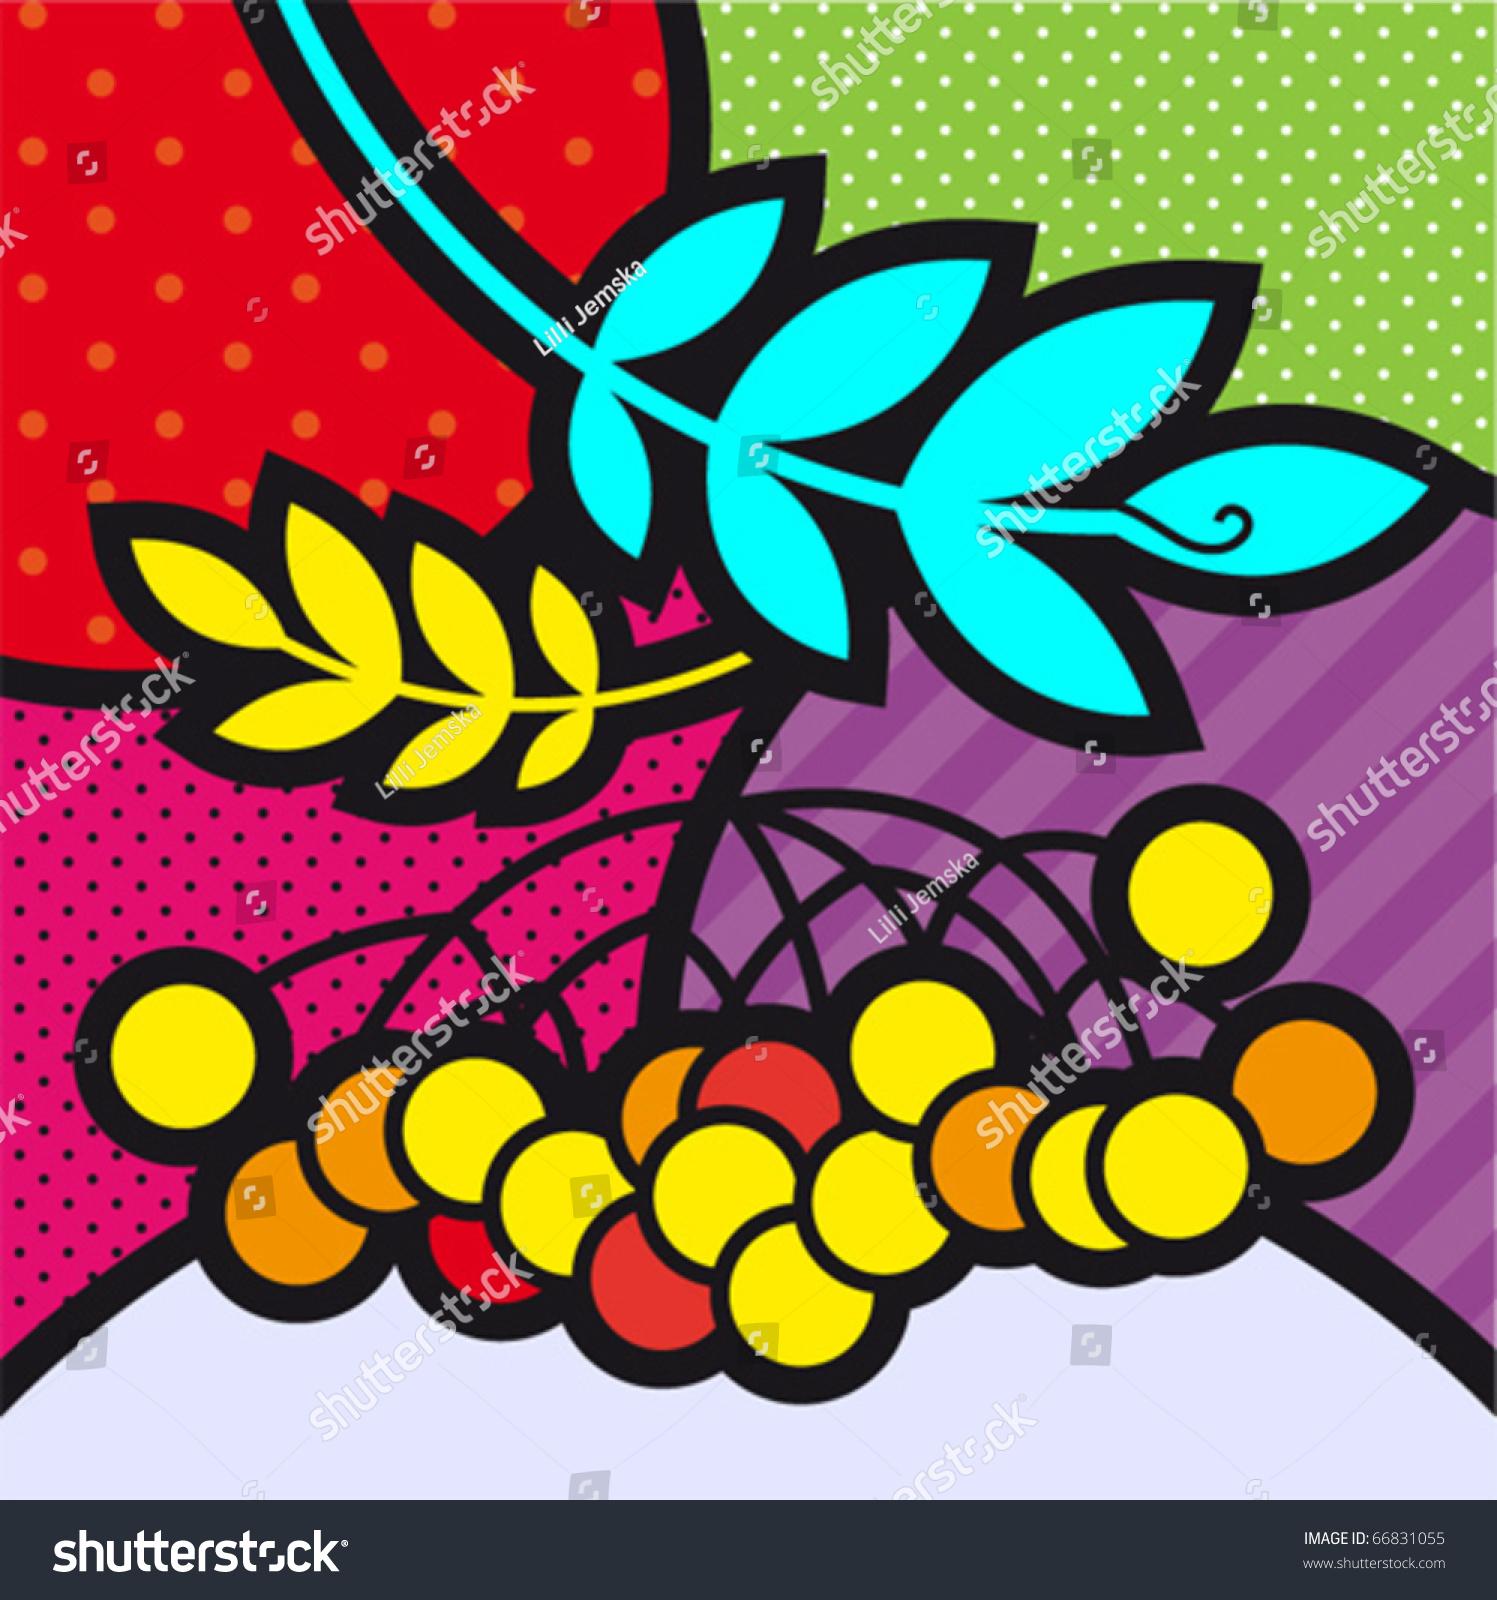 rowan popart fruits vector illustration design stock vector 66831055 shutterstock. Black Bedroom Furniture Sets. Home Design Ideas